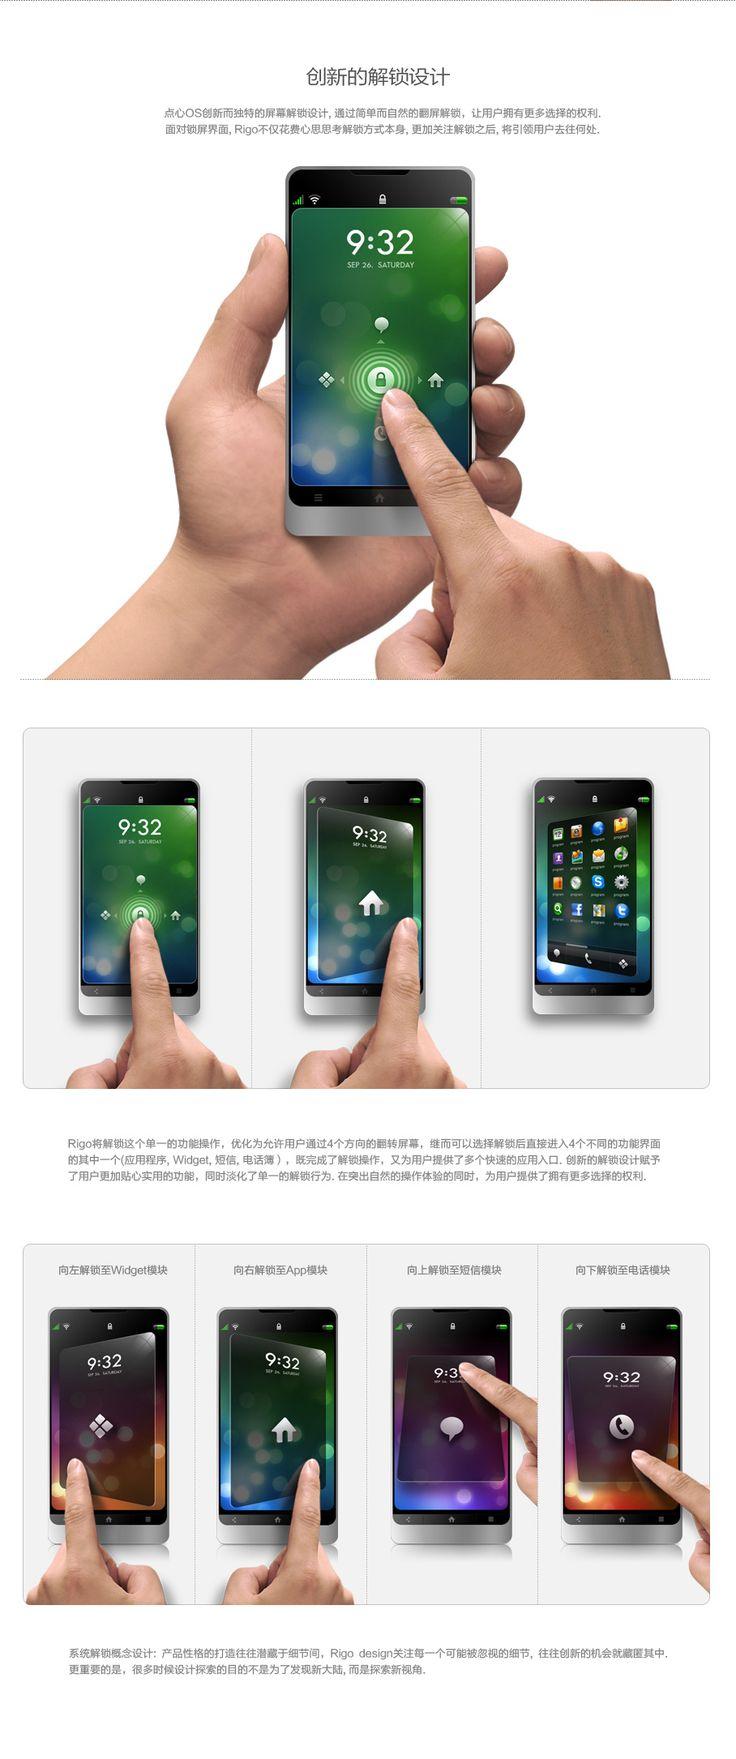 Tapas Phone OS design - RIGO DESIGNDesign Inspiration, Ui Design, Os Design, Rigo Design, Phones Os, Tapas Phones, User Interface, Design Concept, Mobiles Ux Web Design